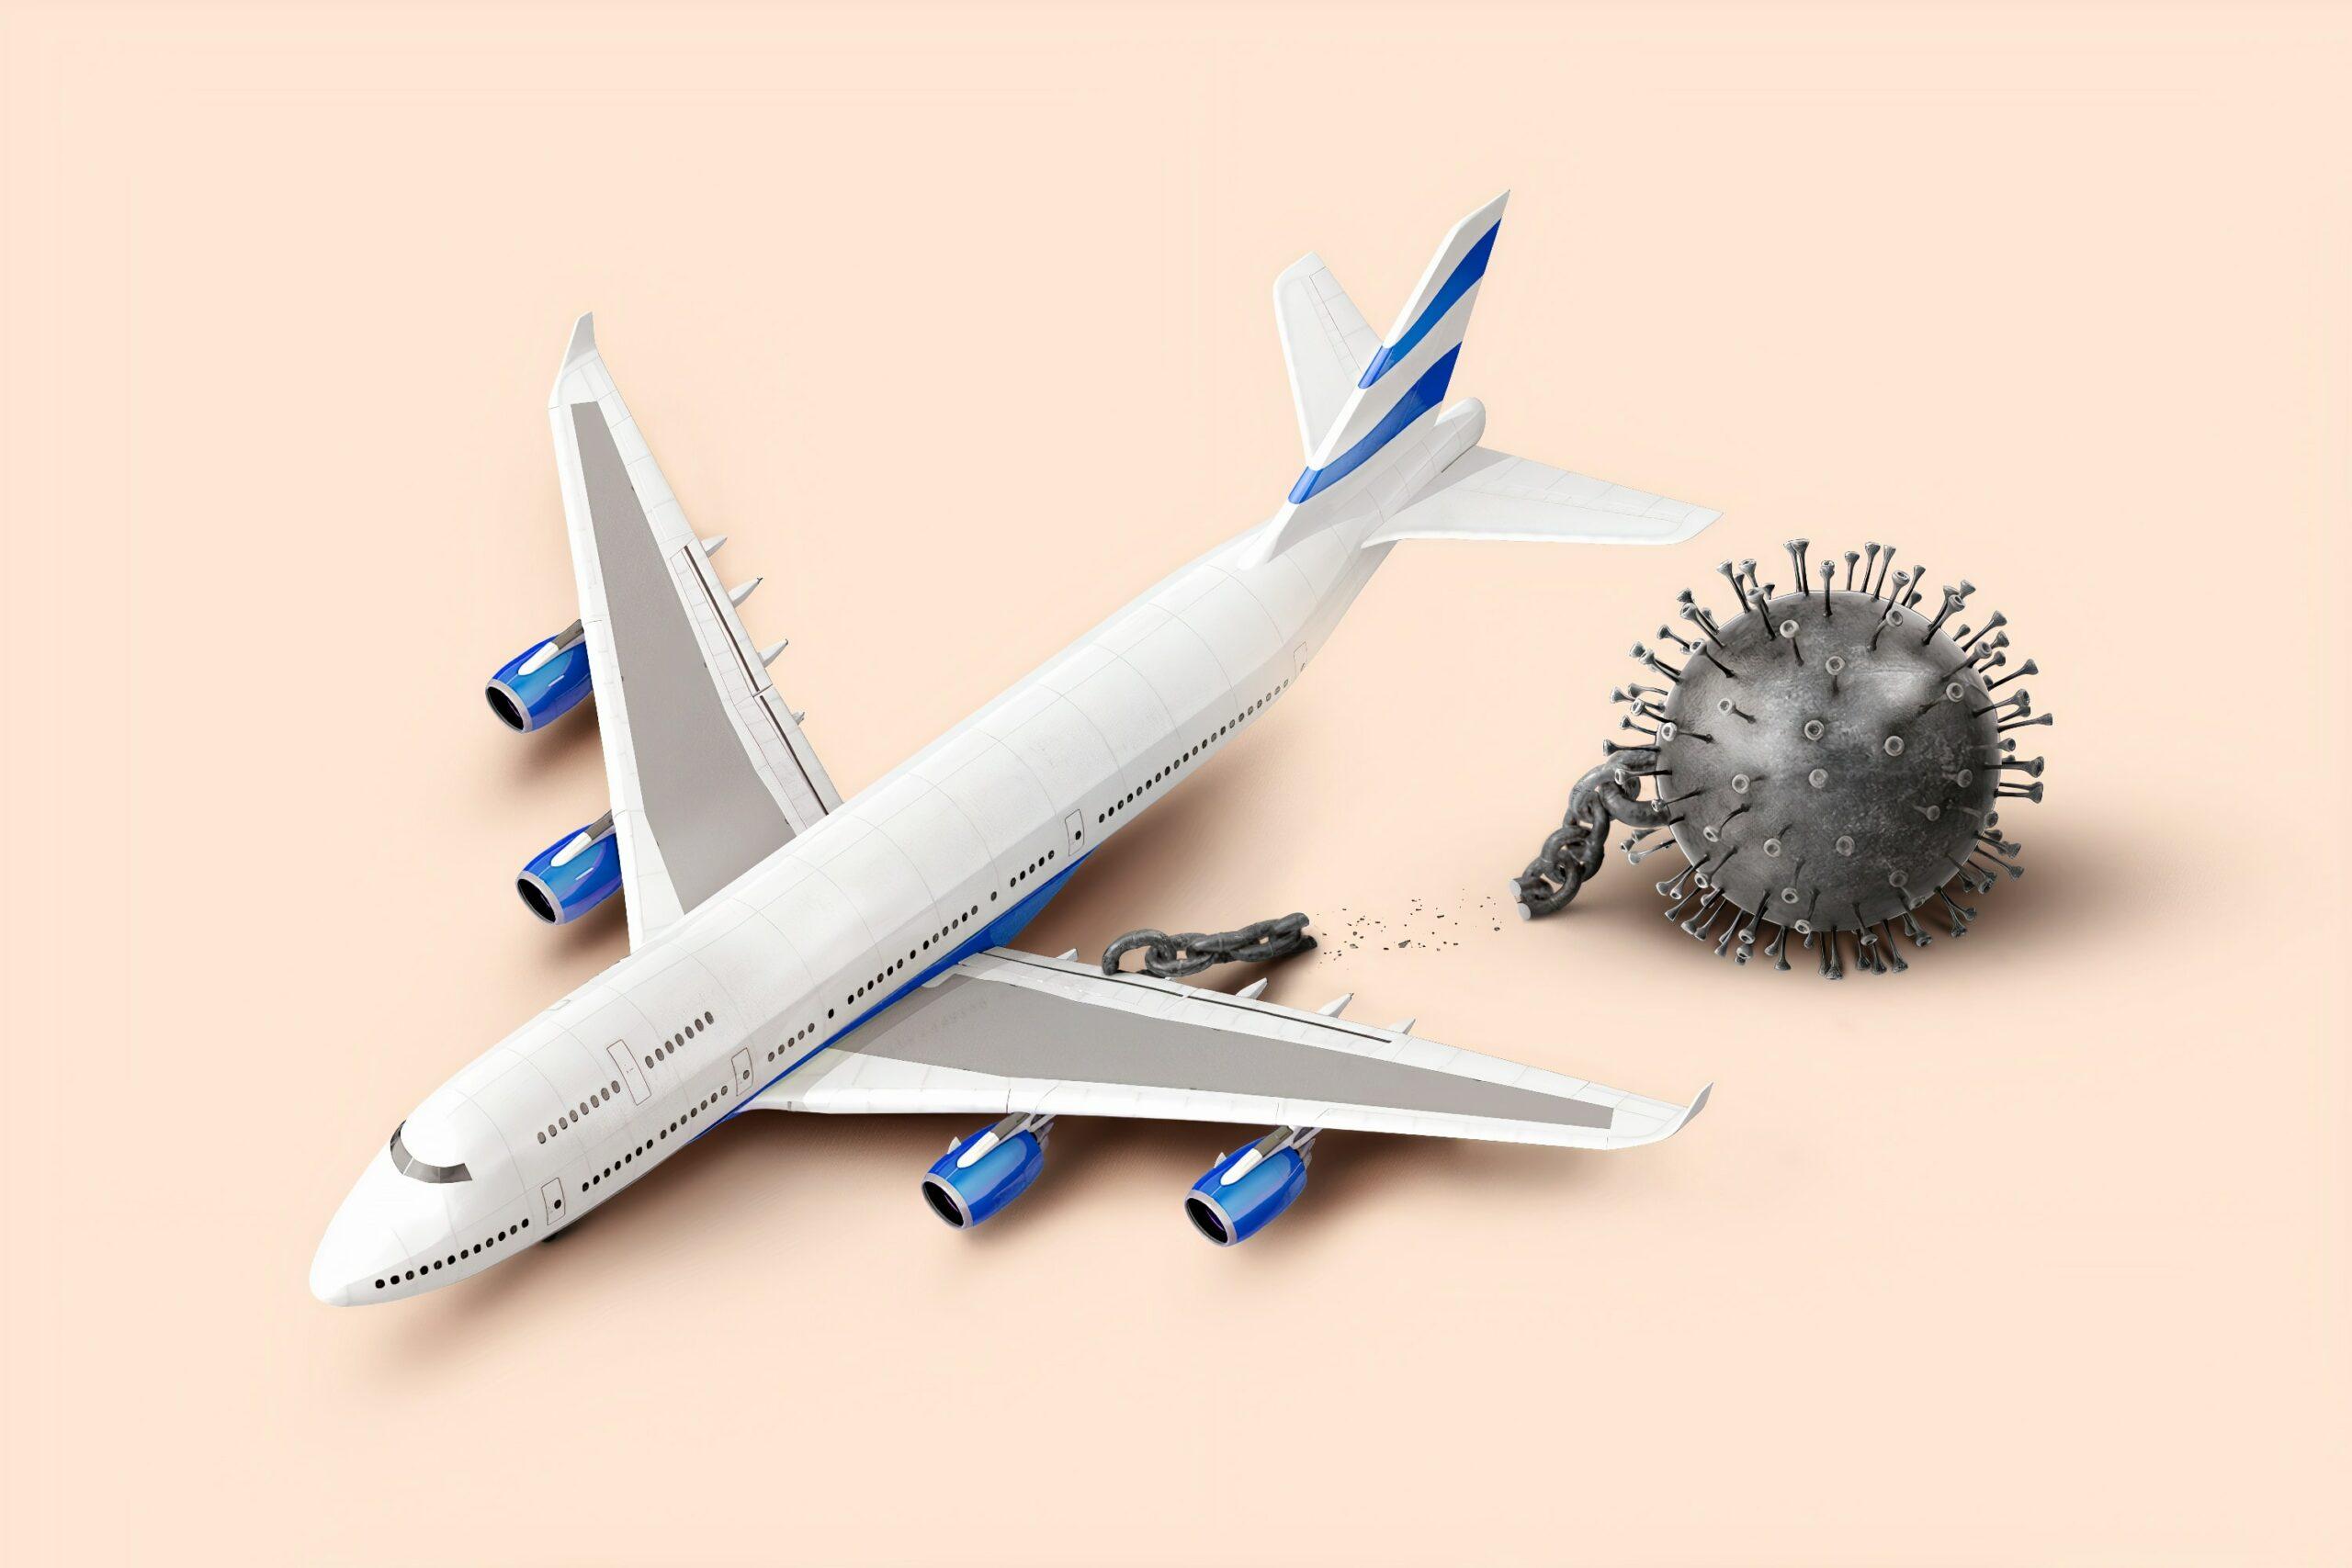 Covid 19 Les Risques De Contamination En Avion Plus Faibles Que Prevu